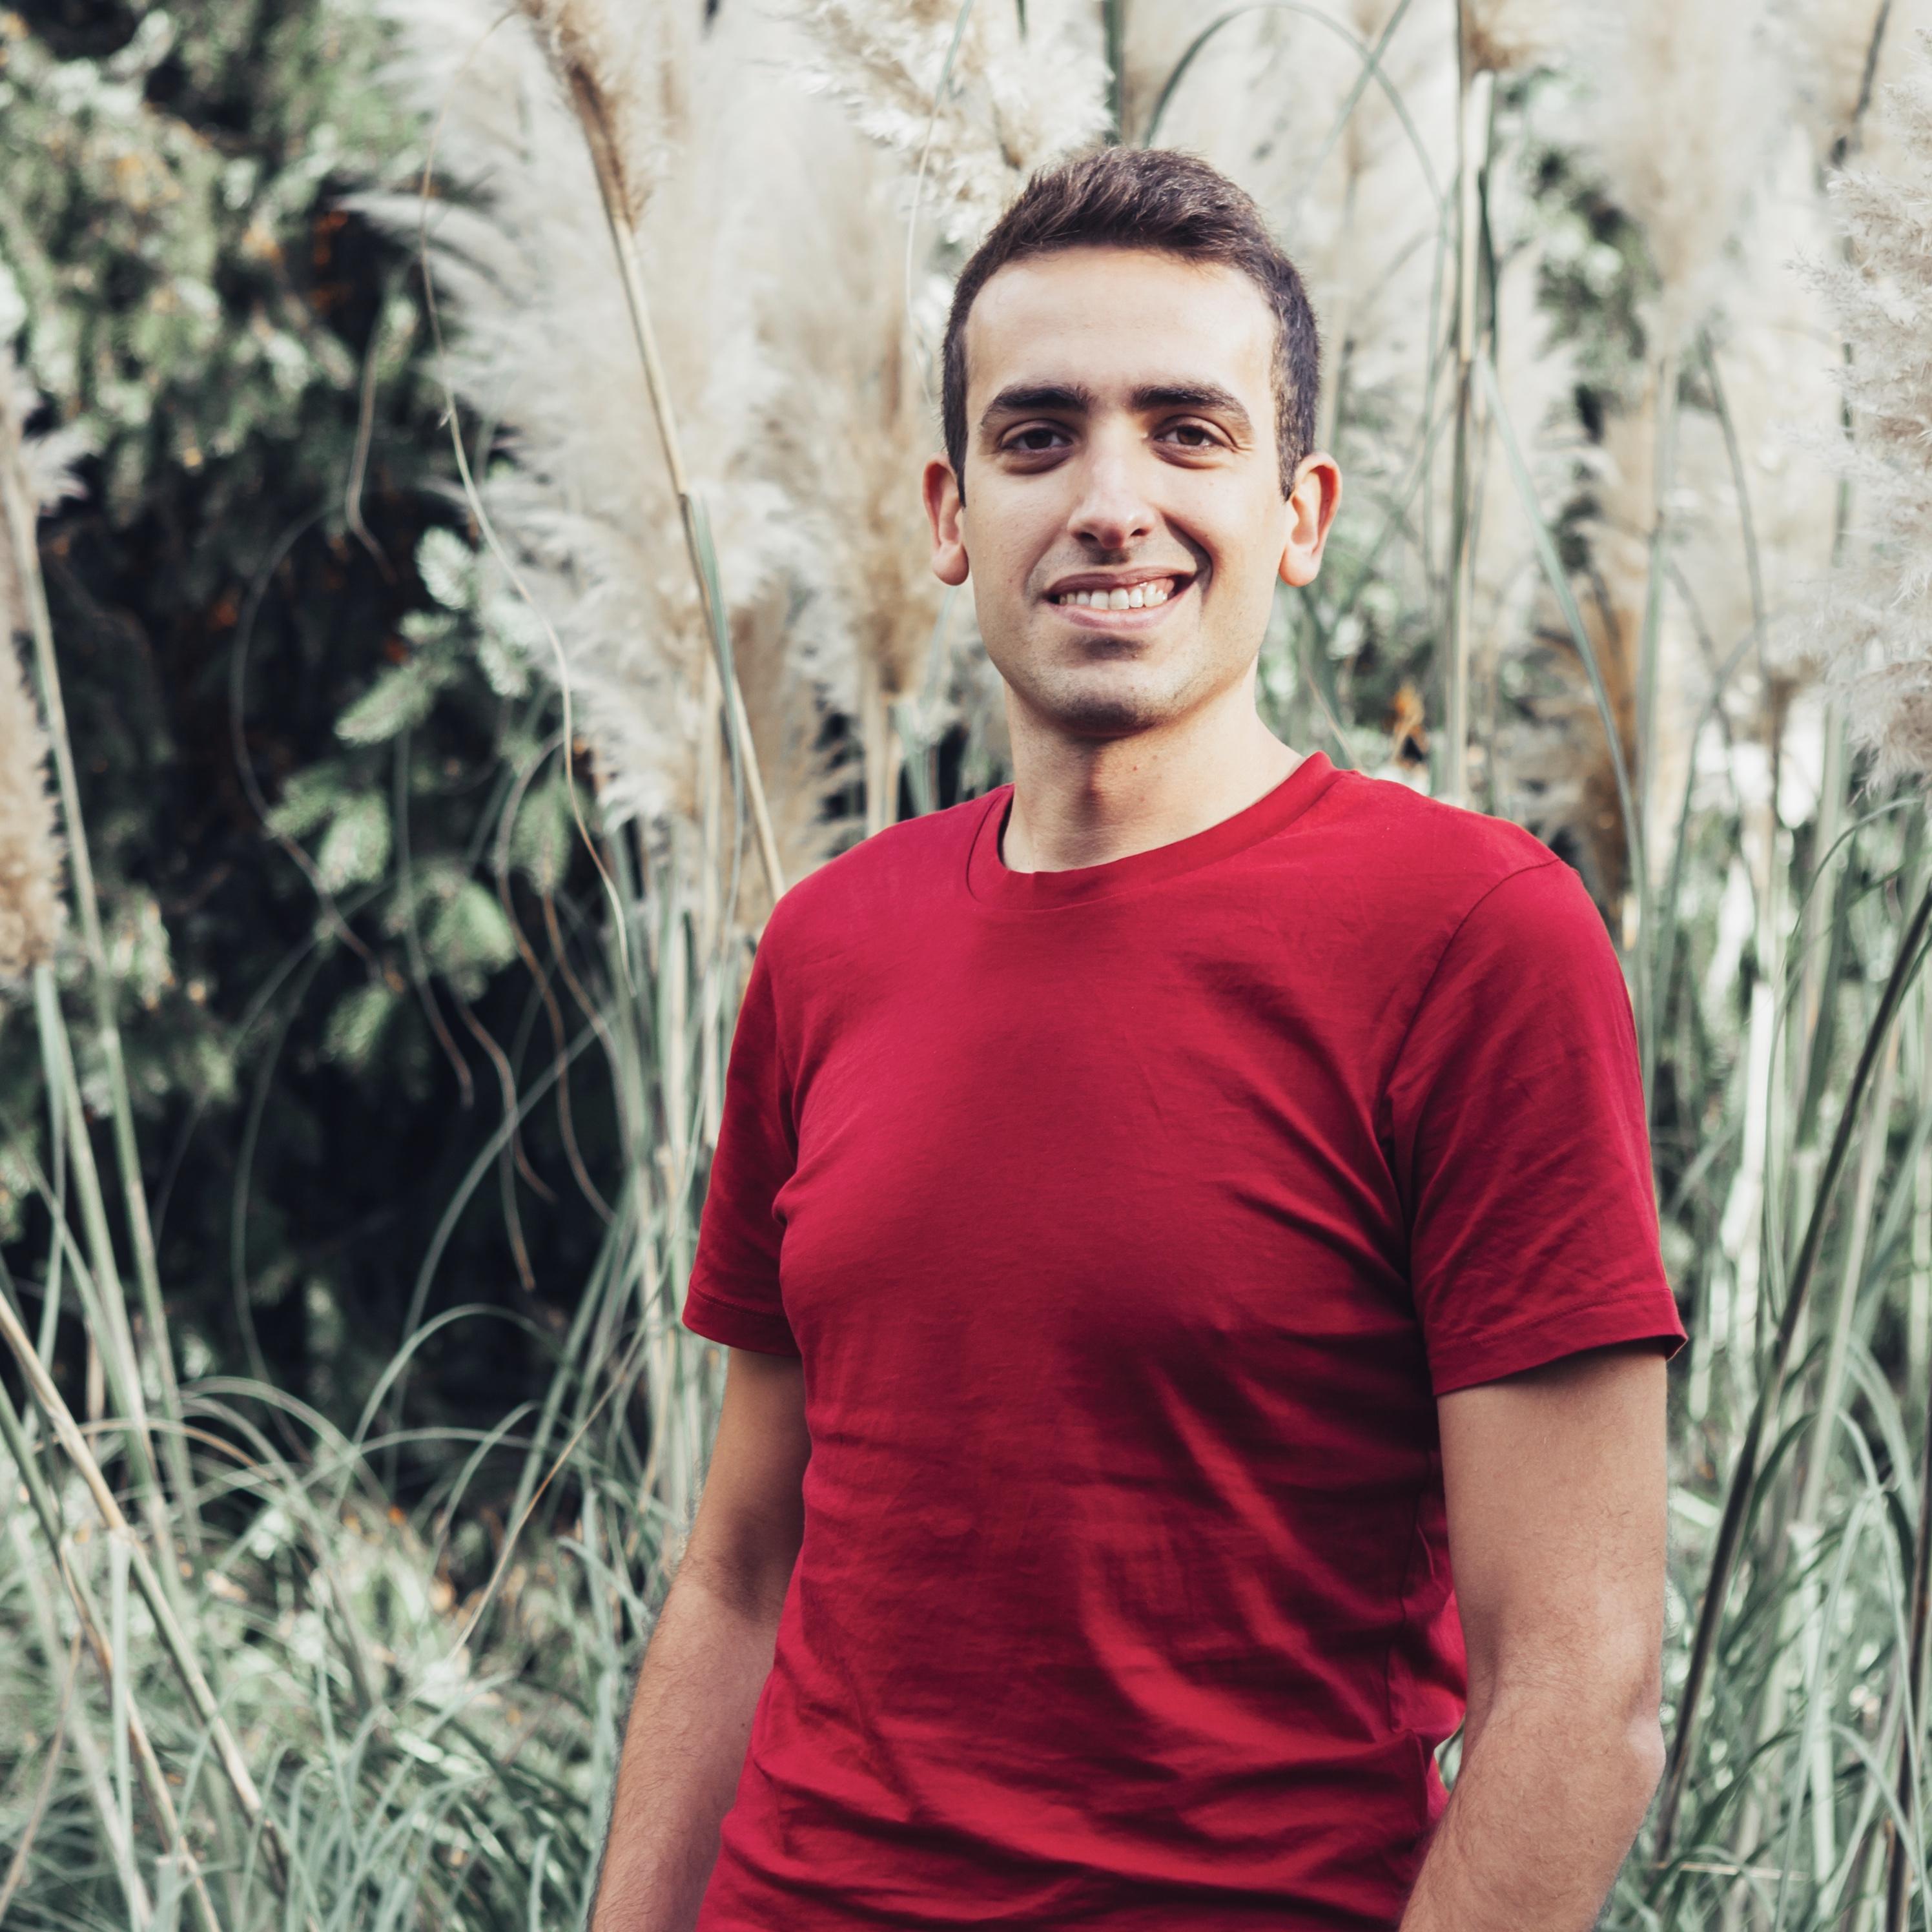 Emiliano Viscarra